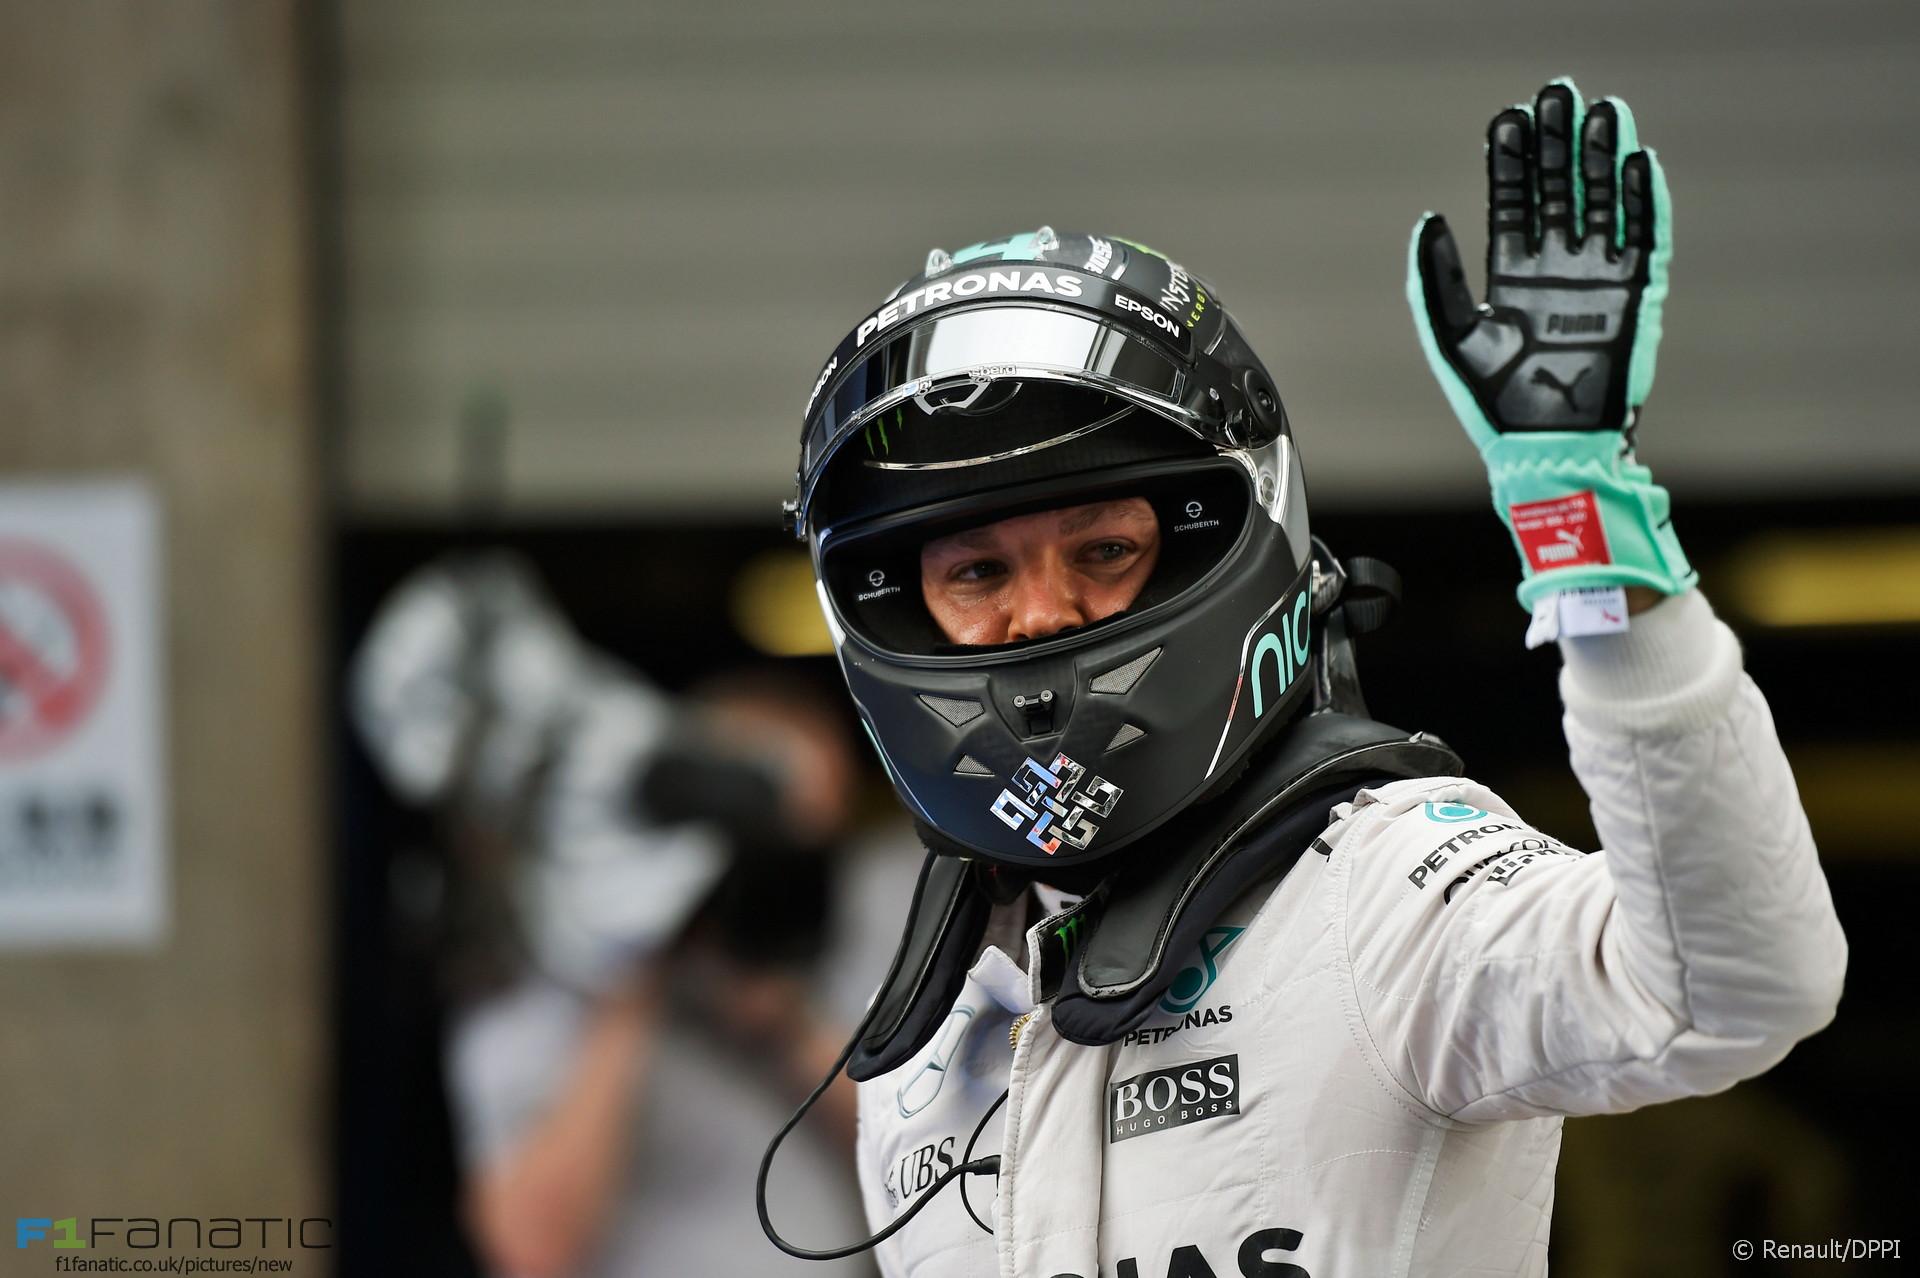 Nico Rosberg, Mercedes, Shanghai International Circuit, 2016